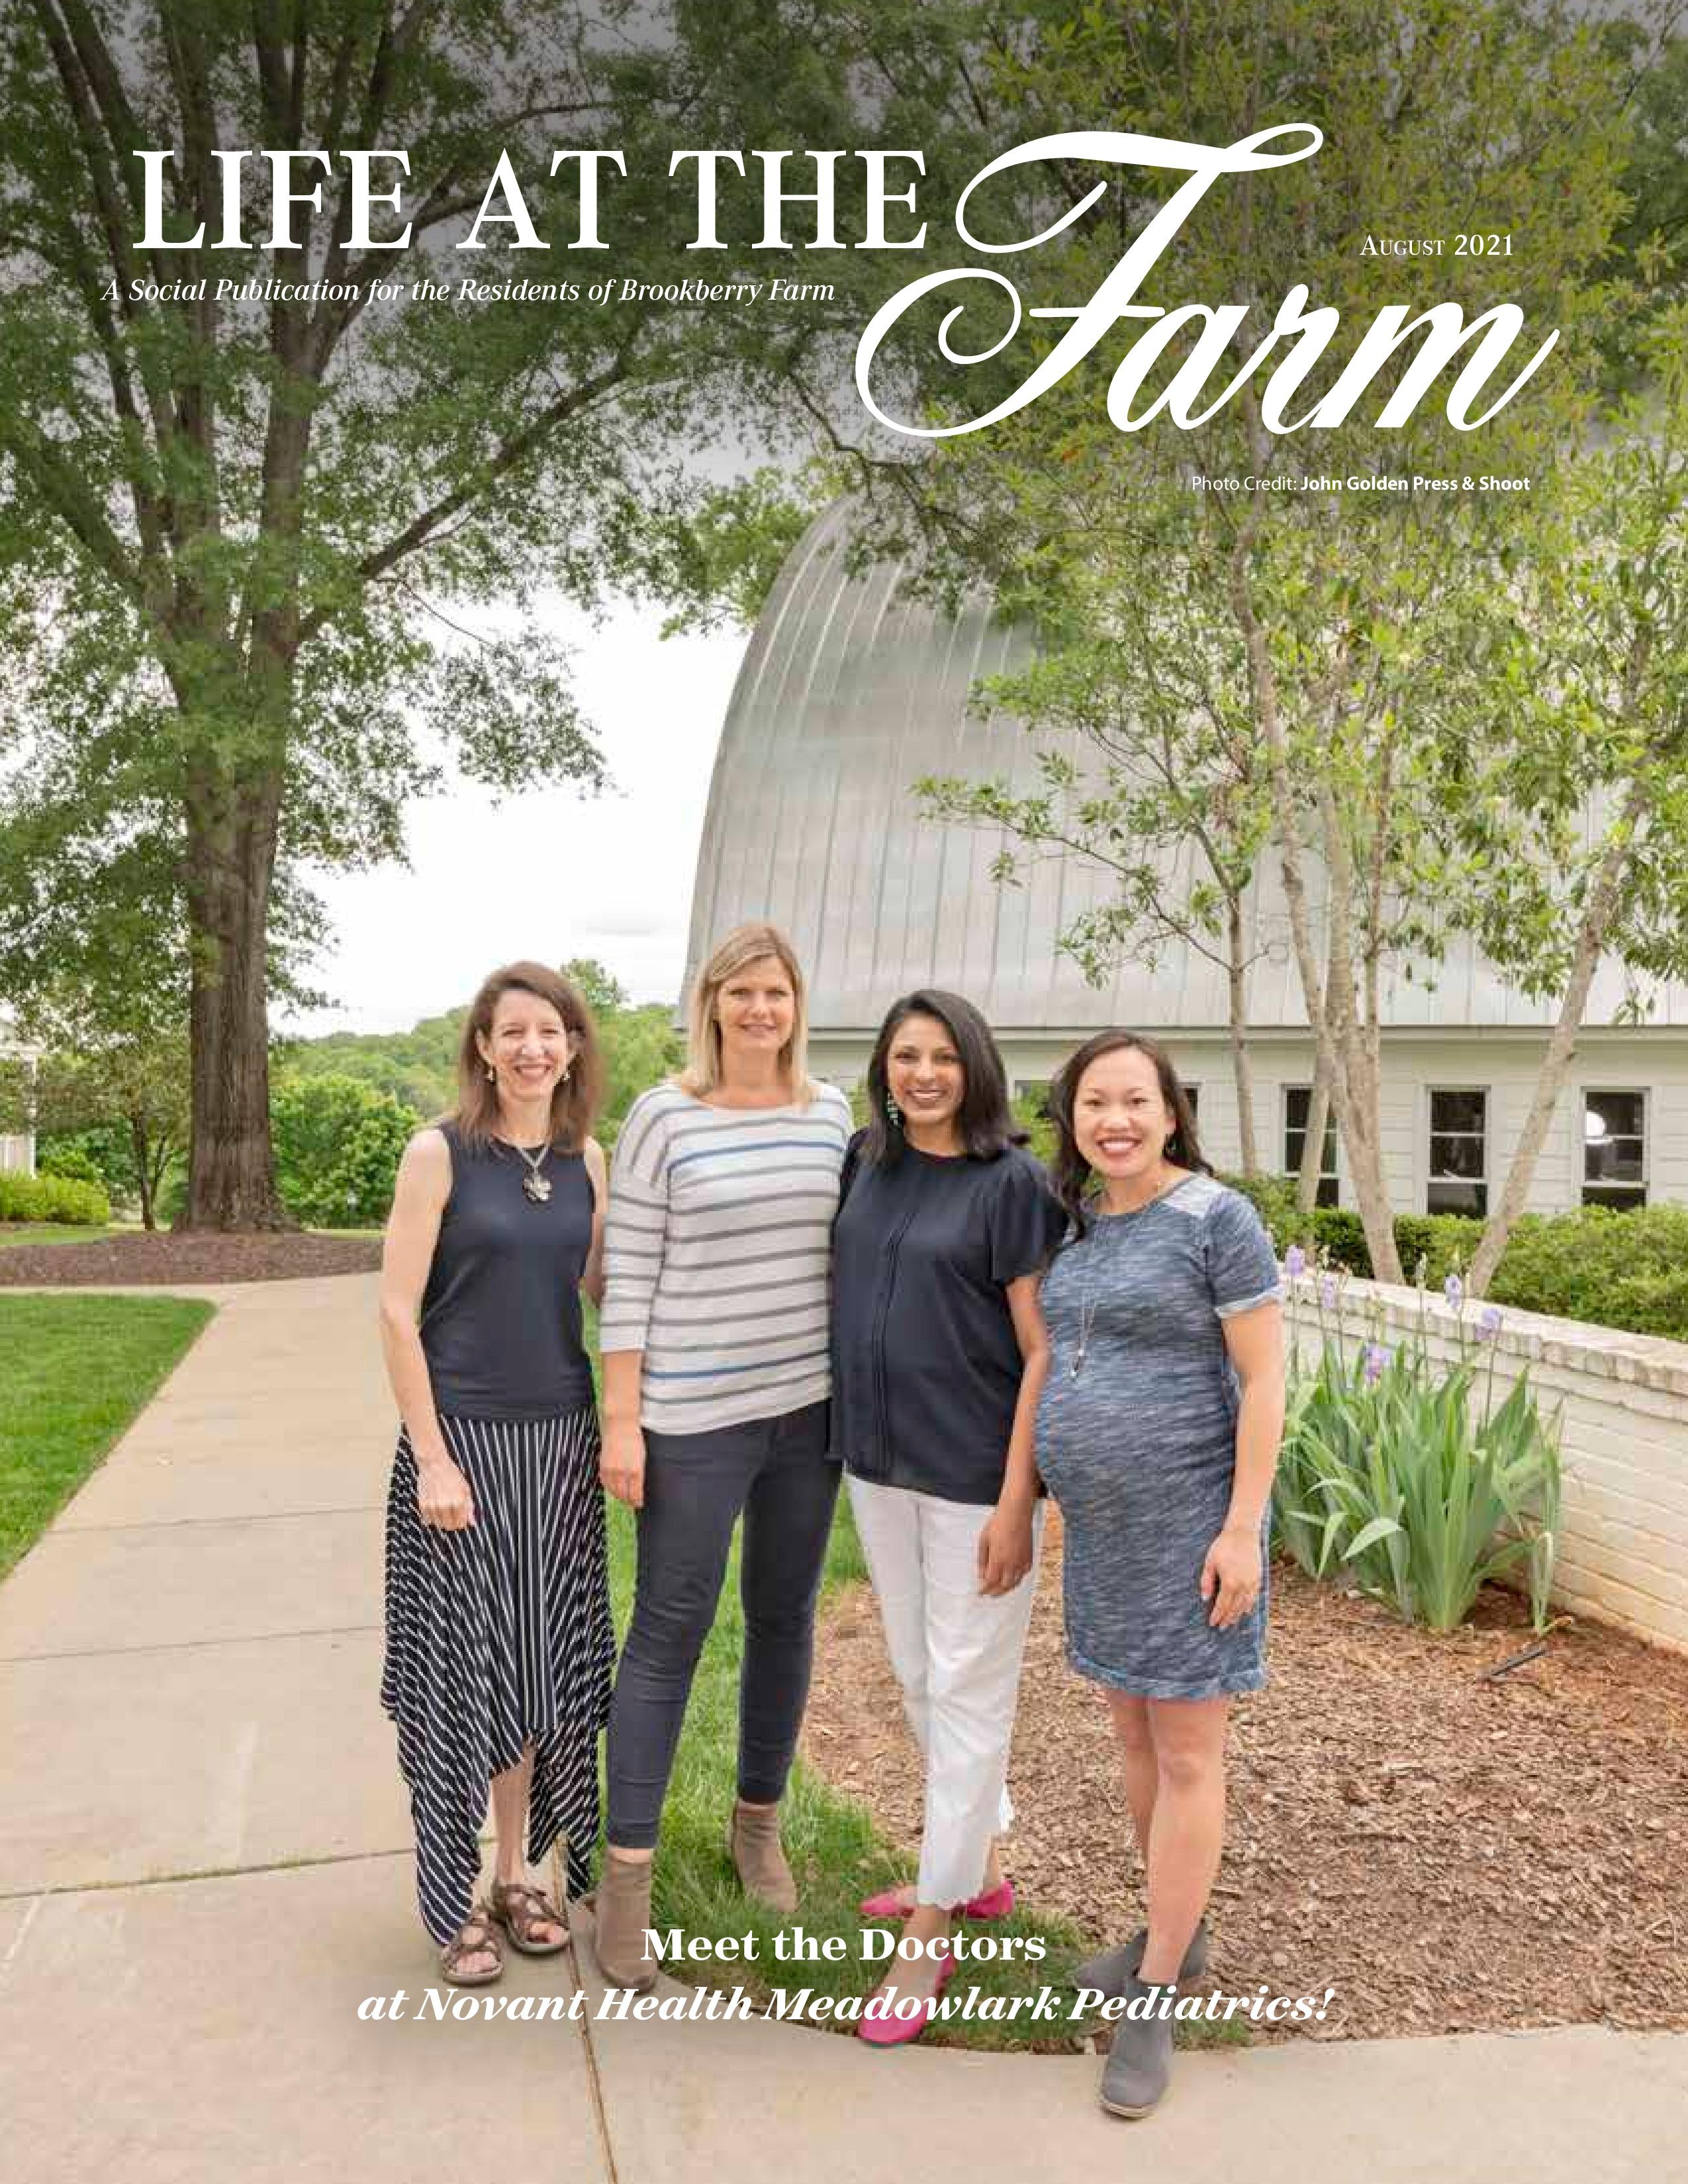 Life at the Farm 2021-08-01